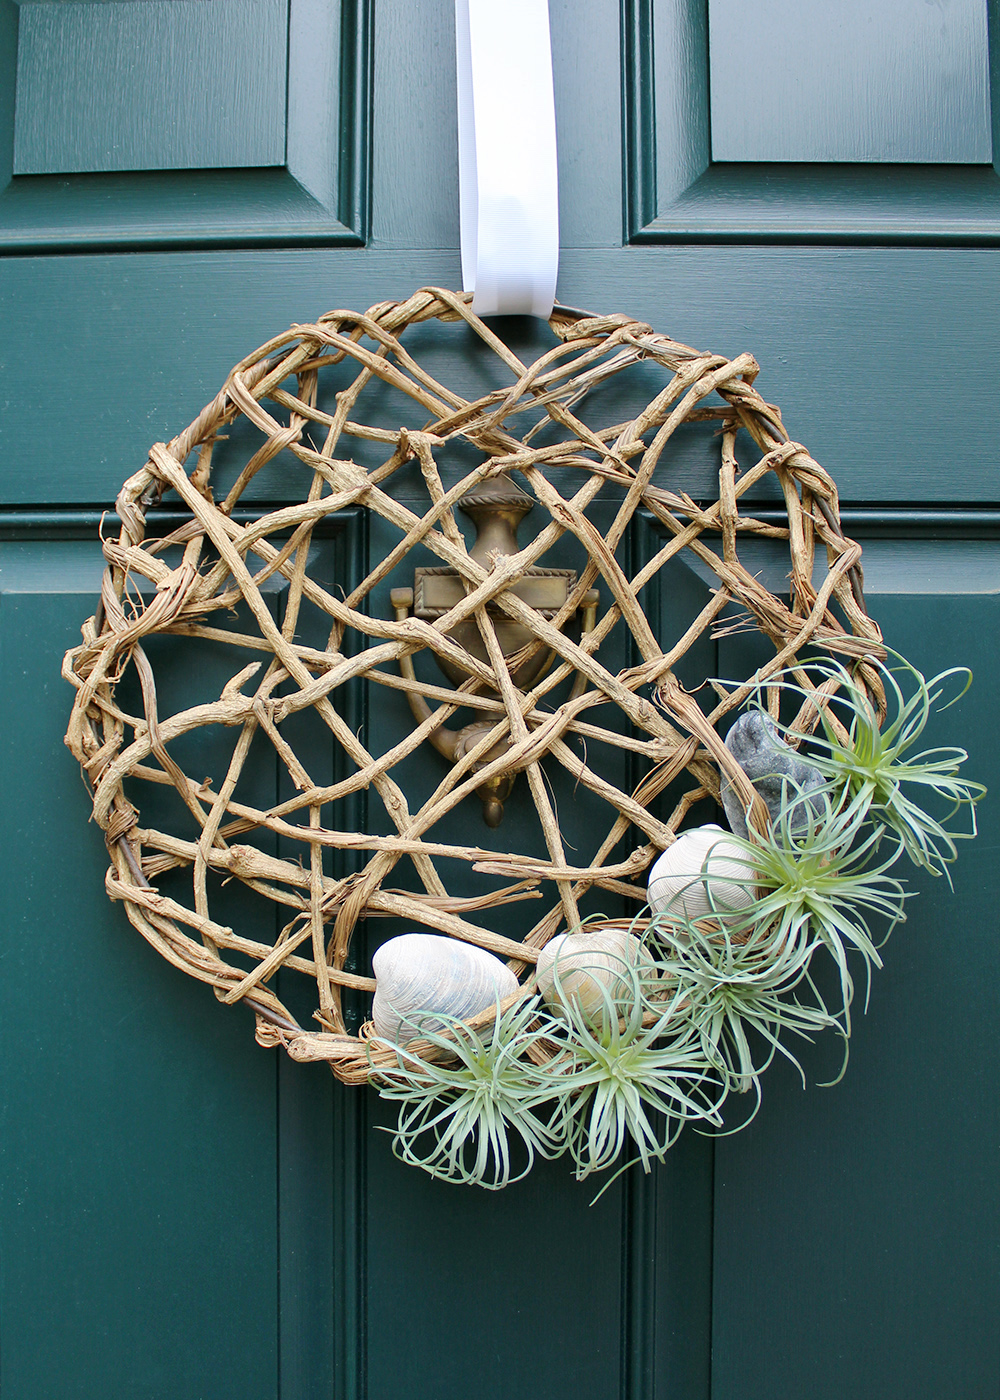 how to make an air plant wreath with seashells for $25 #summerDIY #creativewreath